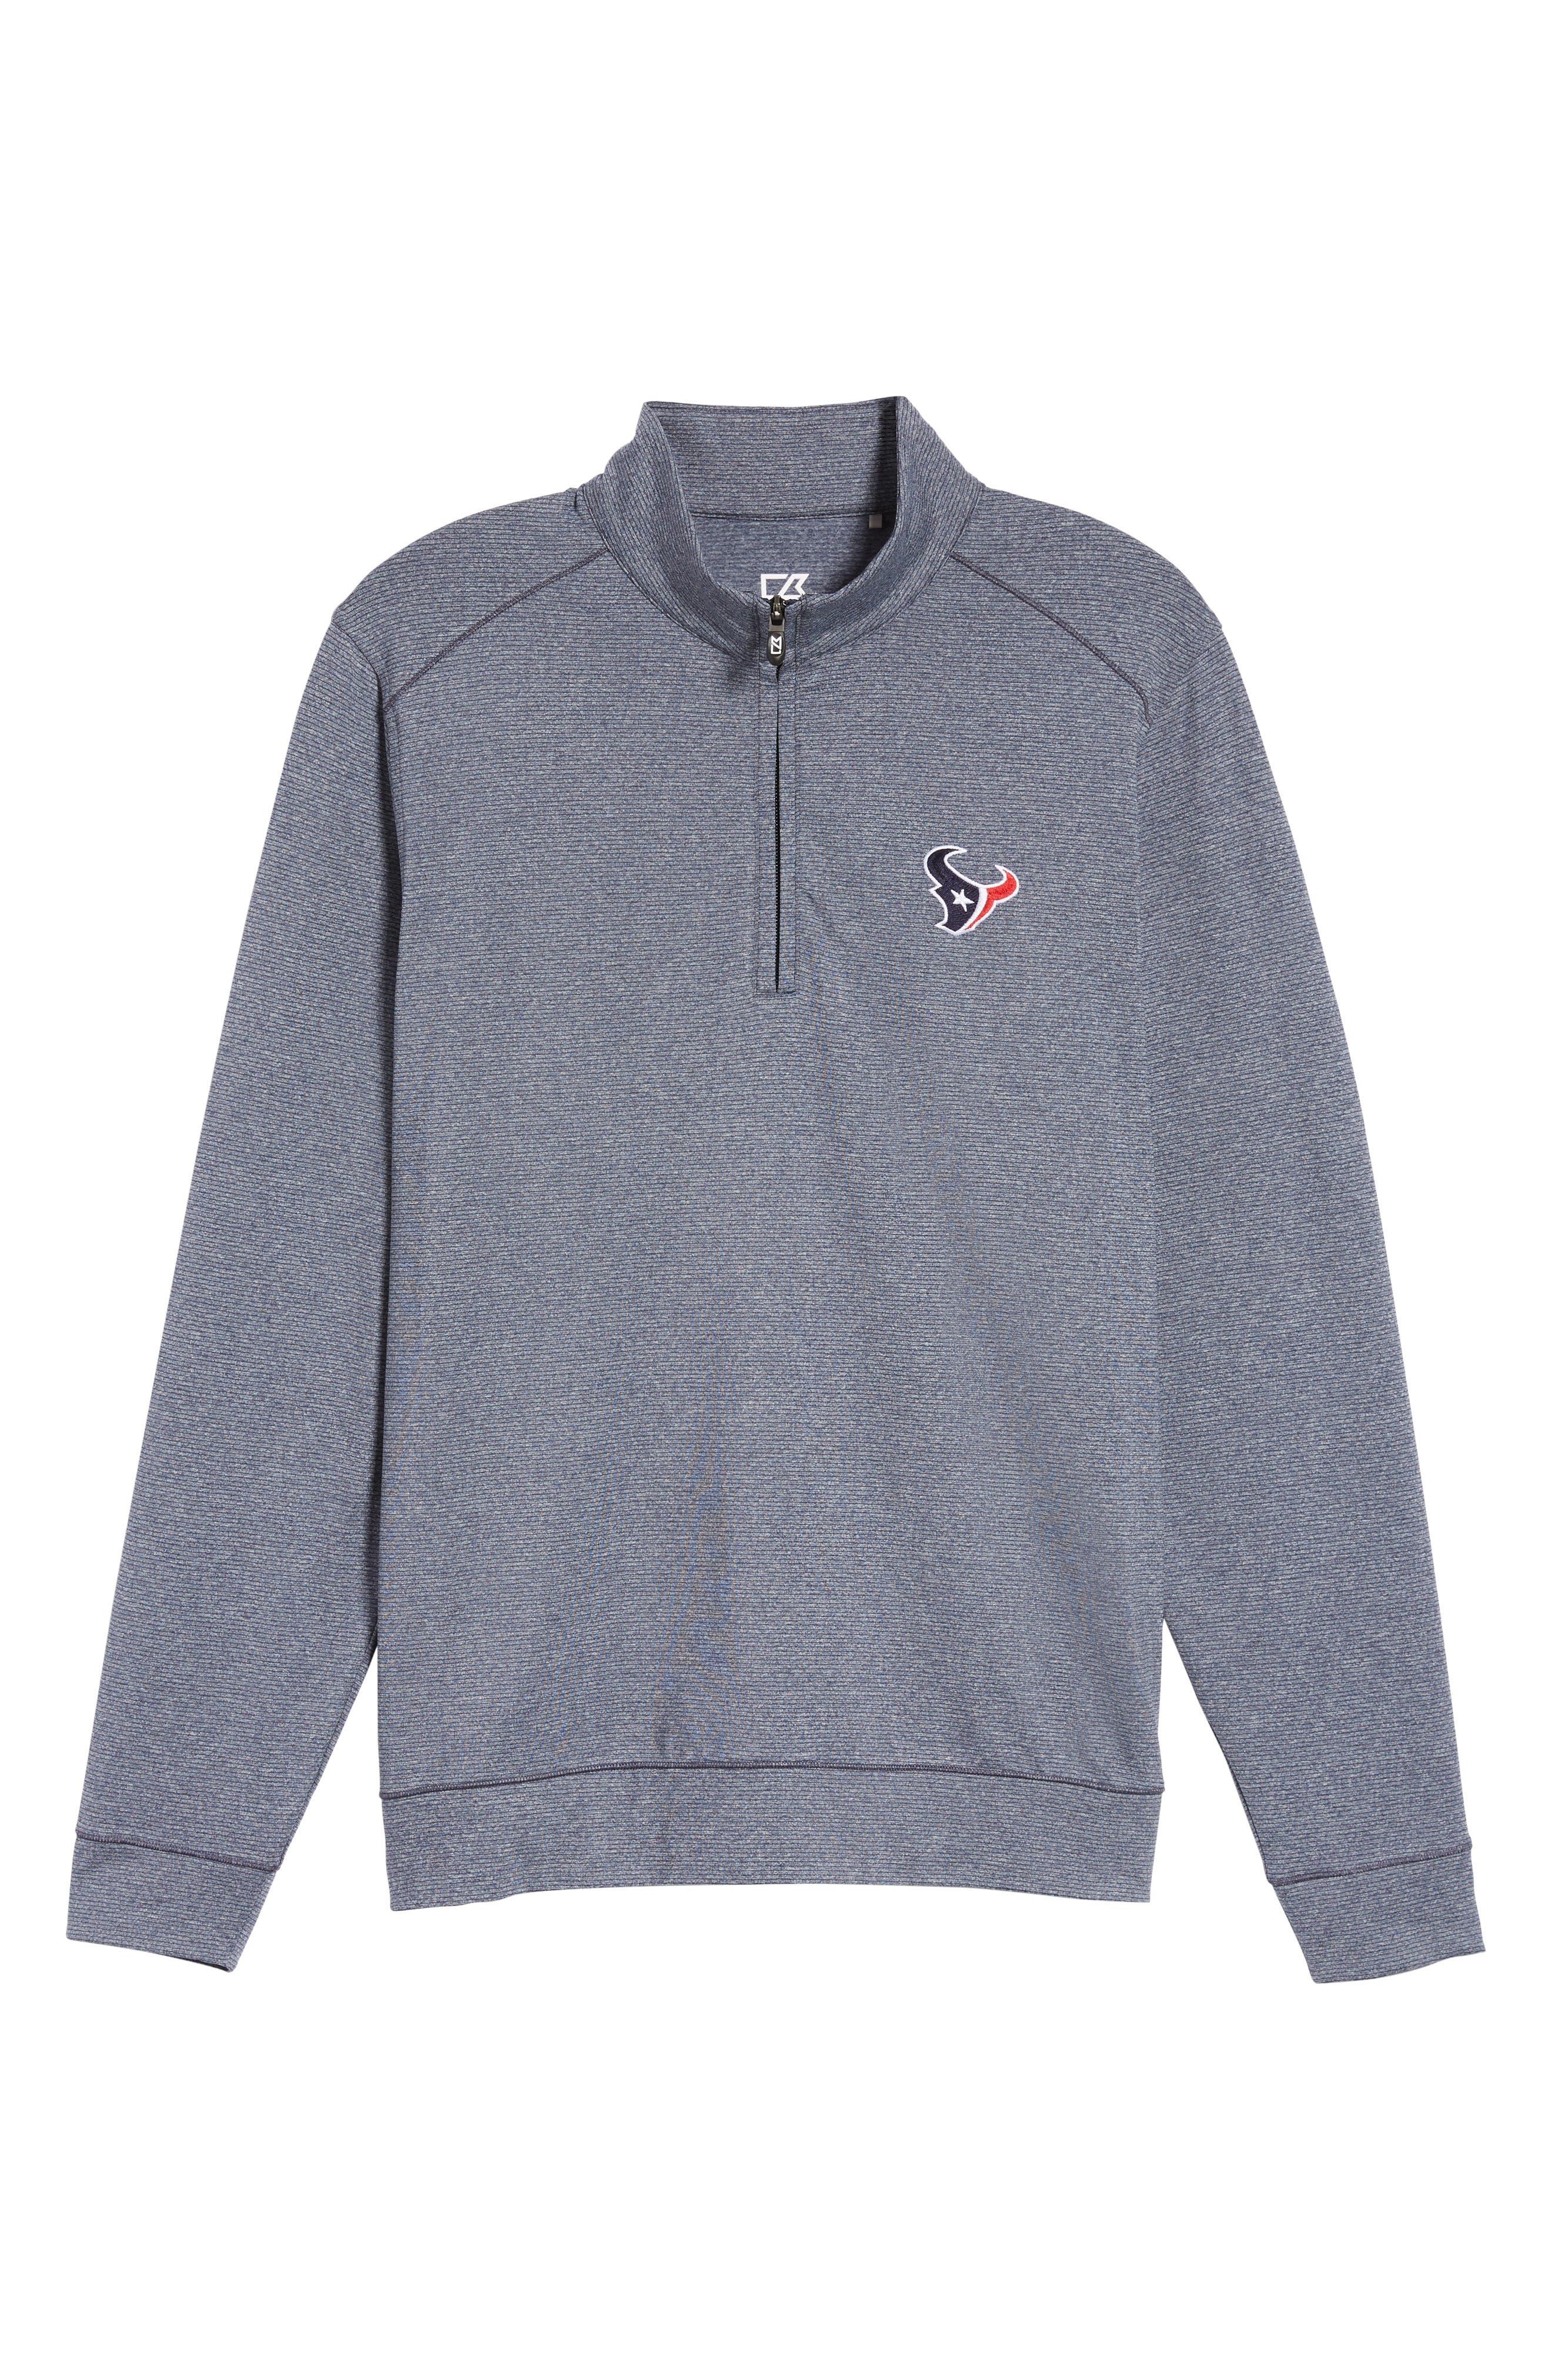 Shoreline - Houston Texans Half Zip Pullover,                             Alternate thumbnail 6, color,                             Liberty Navy Heather